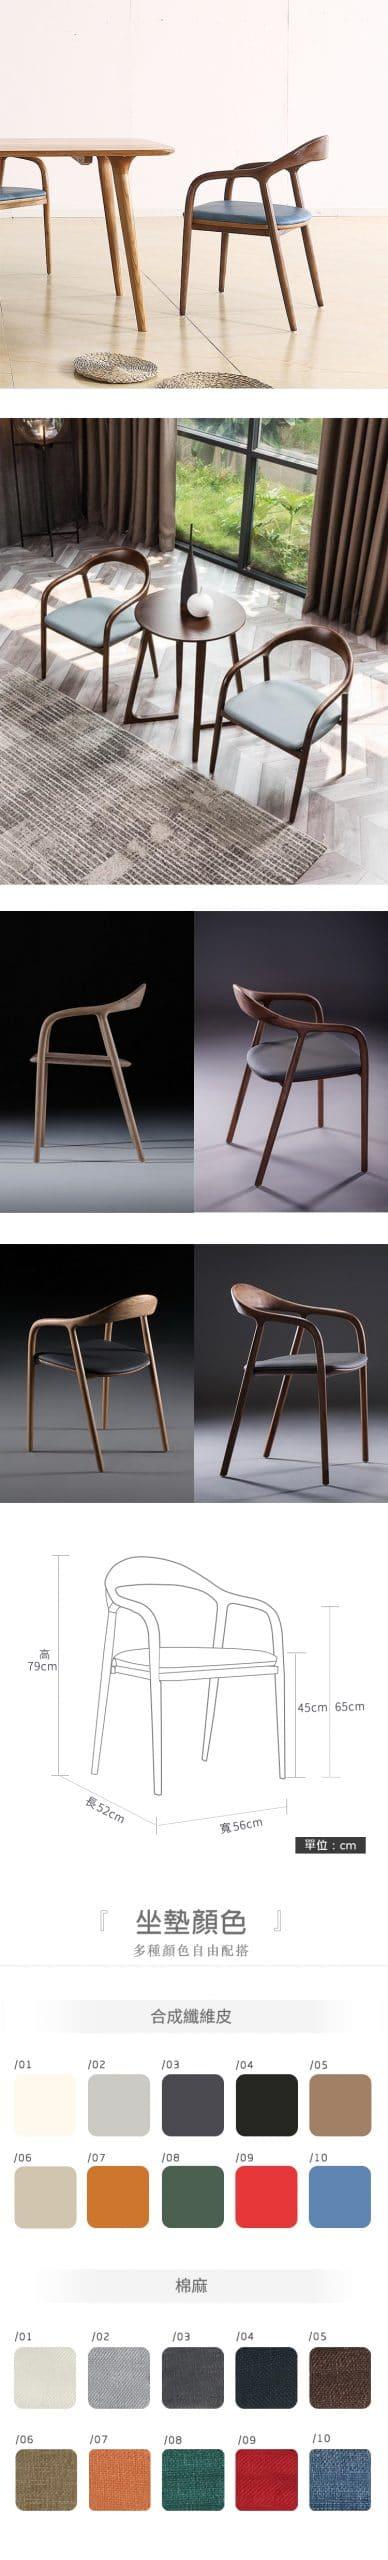 Hiro II 實木餐椅